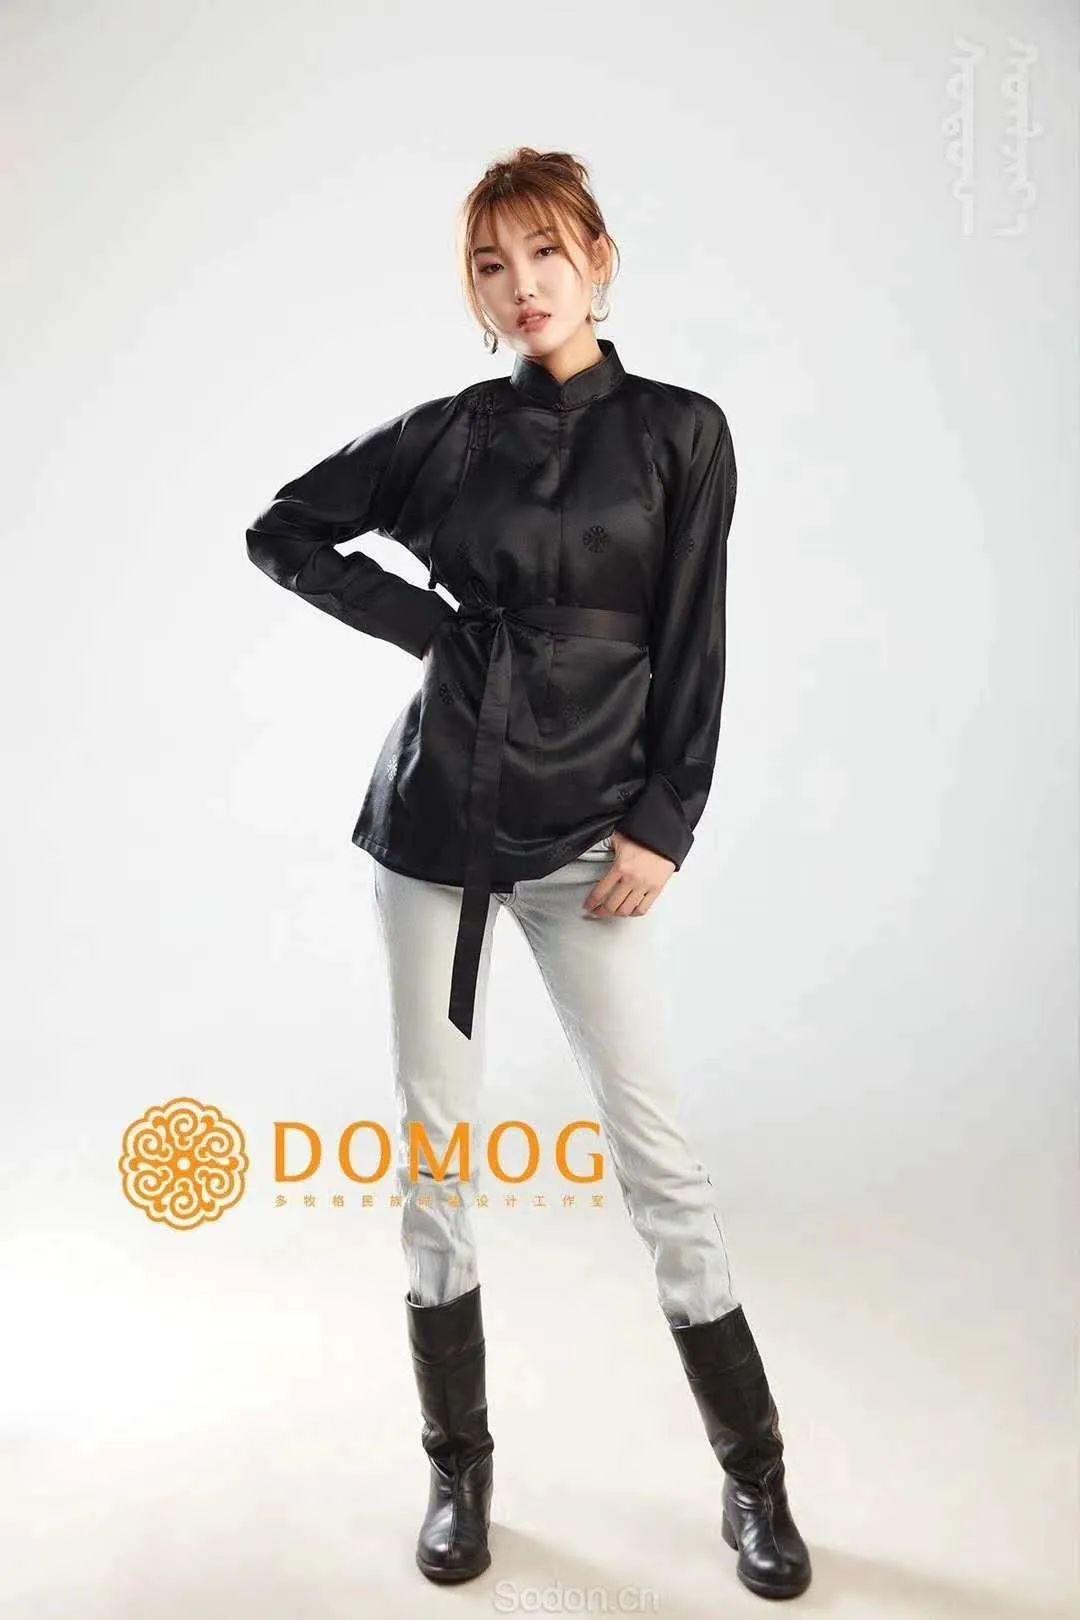 DOMOG 蒙古时装2020新款,民族与时尚的融合 第43张 DOMOG 蒙古时装2020新款,民族与时尚的融合 蒙古服饰